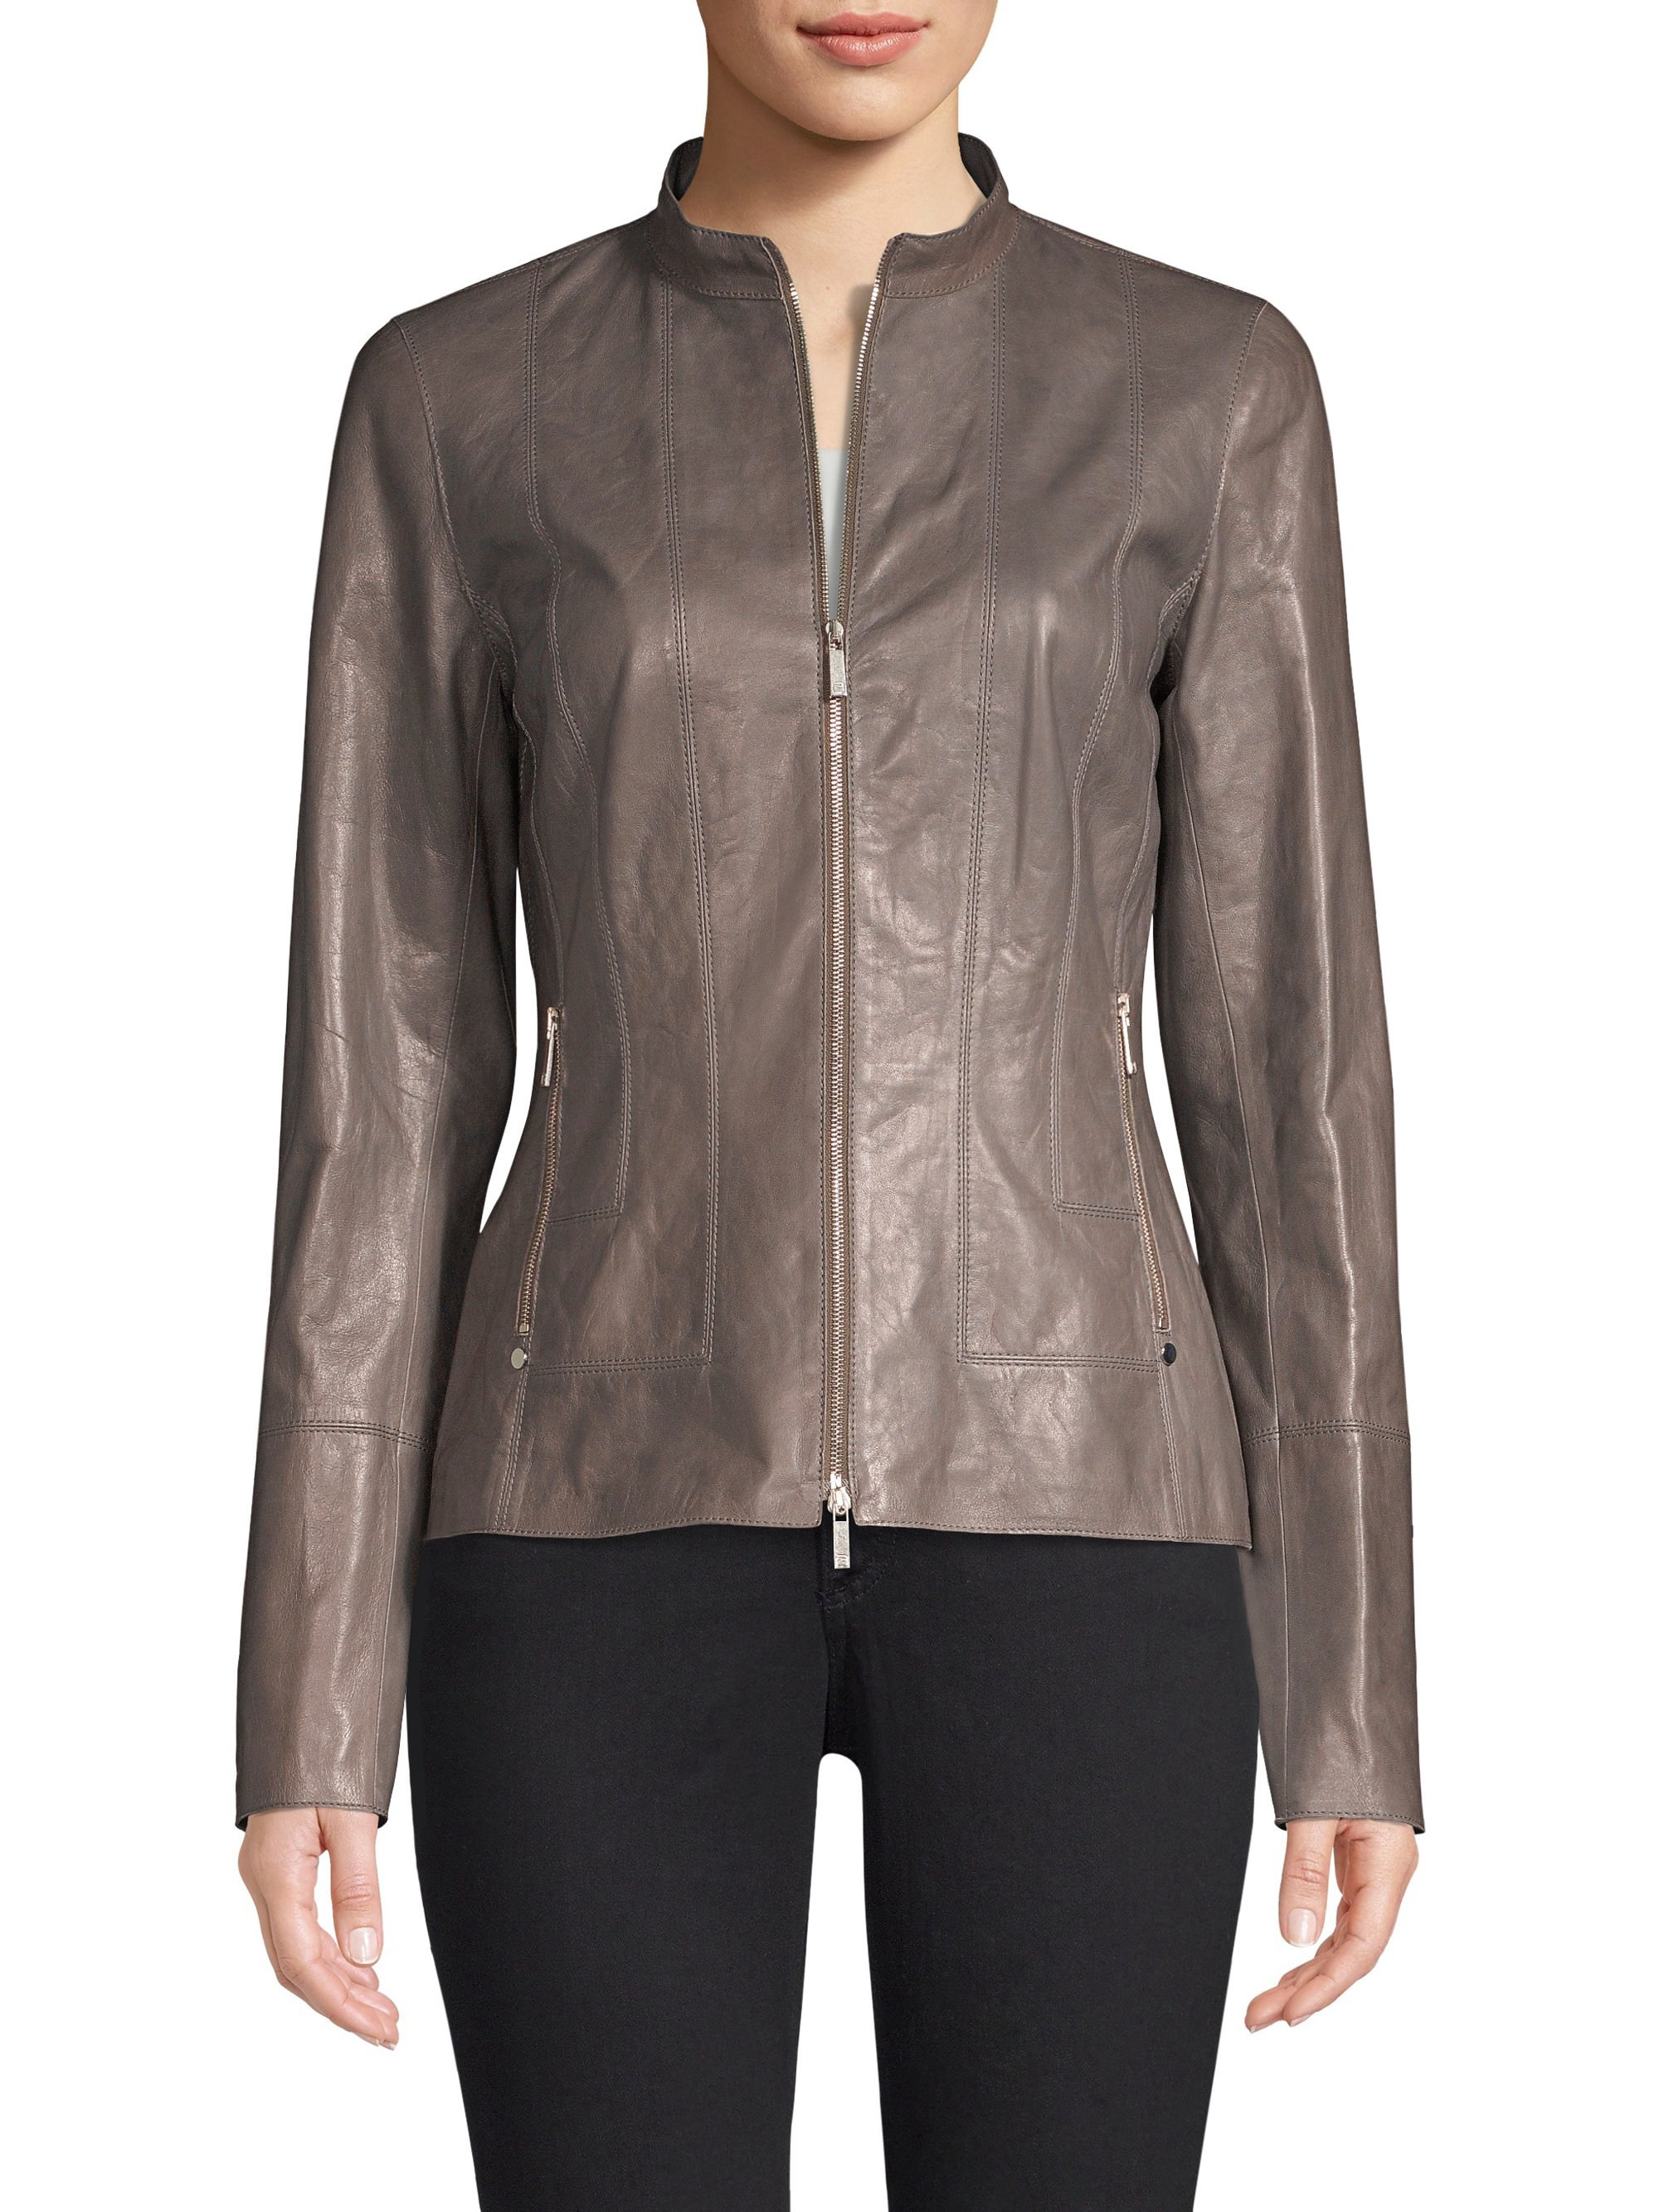 47a280344a22 Lafayette 148 New York Sadie Leather Jacket - Deep Rock 16 ...